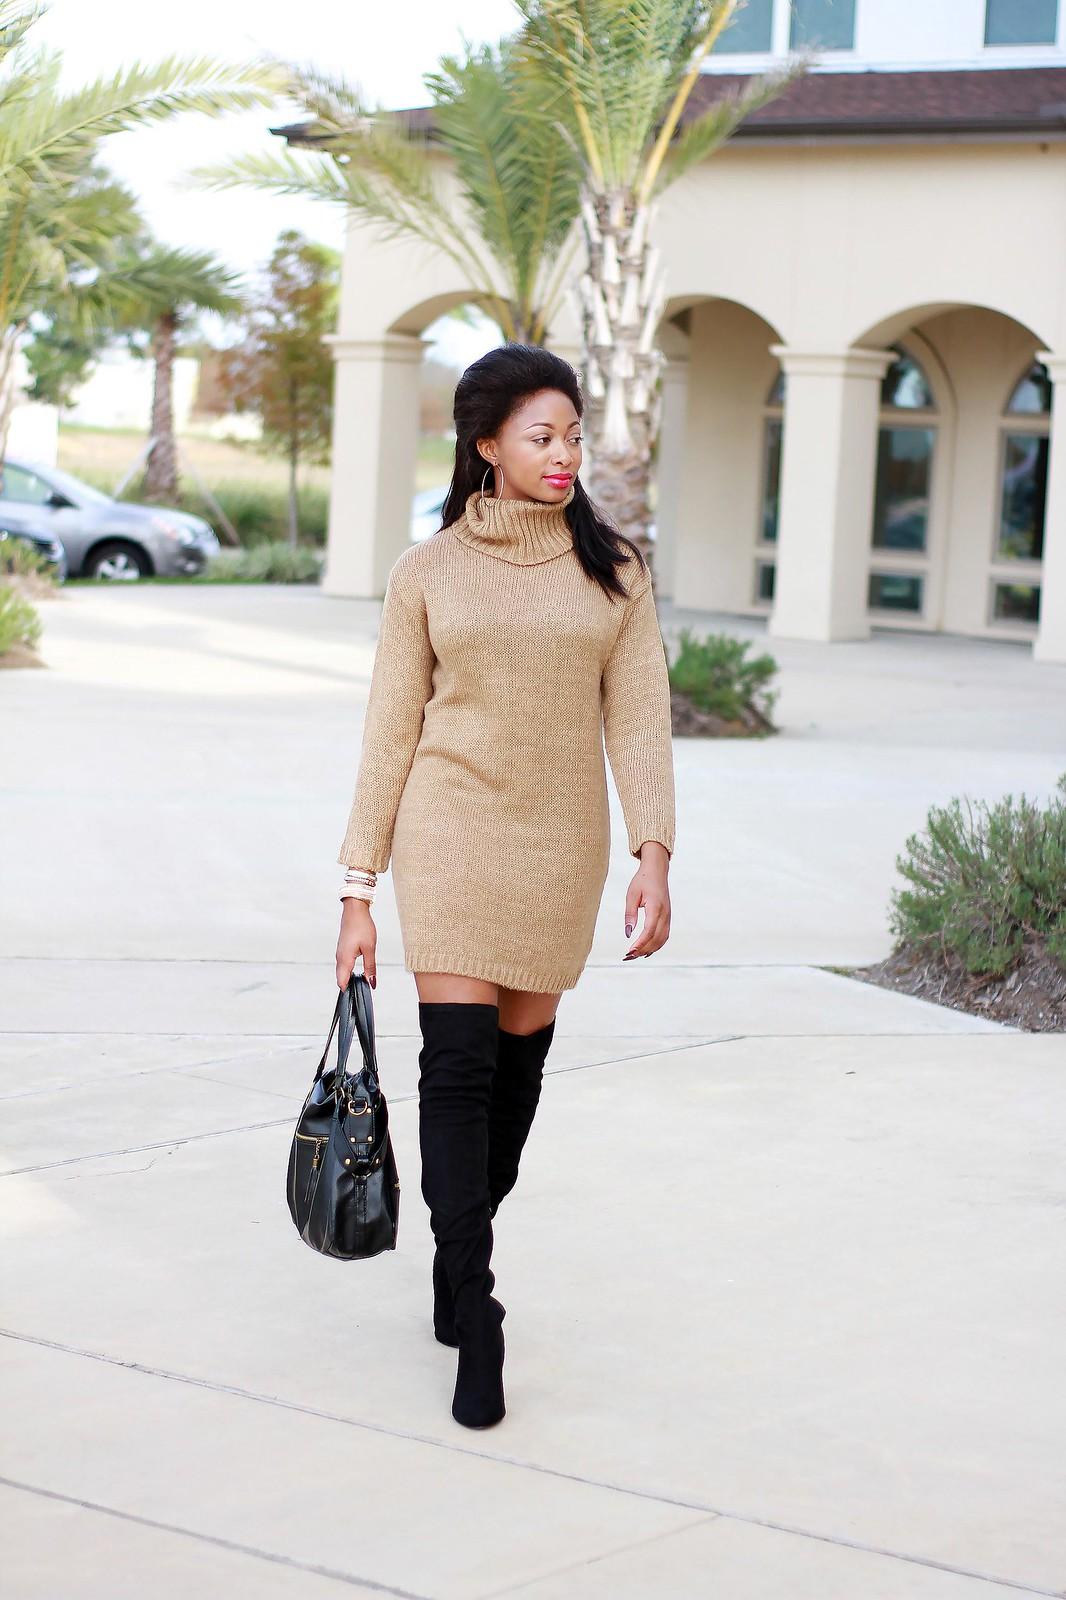 warm dress for winter knit sweater dress